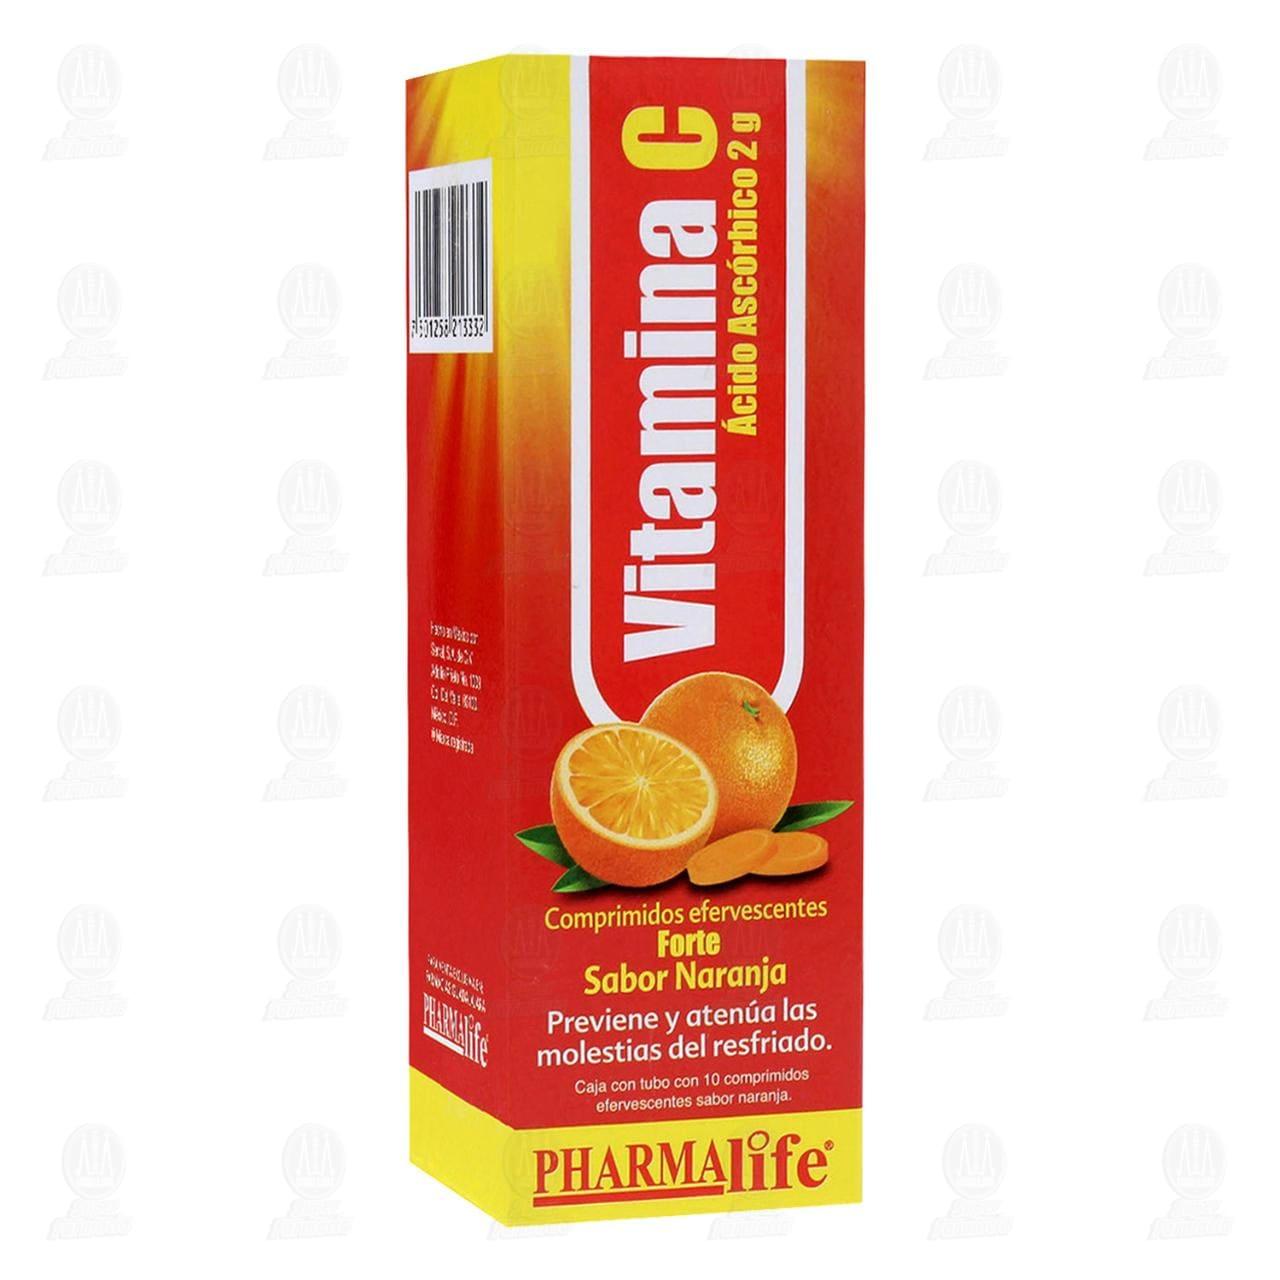 Comprar Vitamina C 2gr 10 Comprimidos Pharmalife en Farmacias Guadalajara